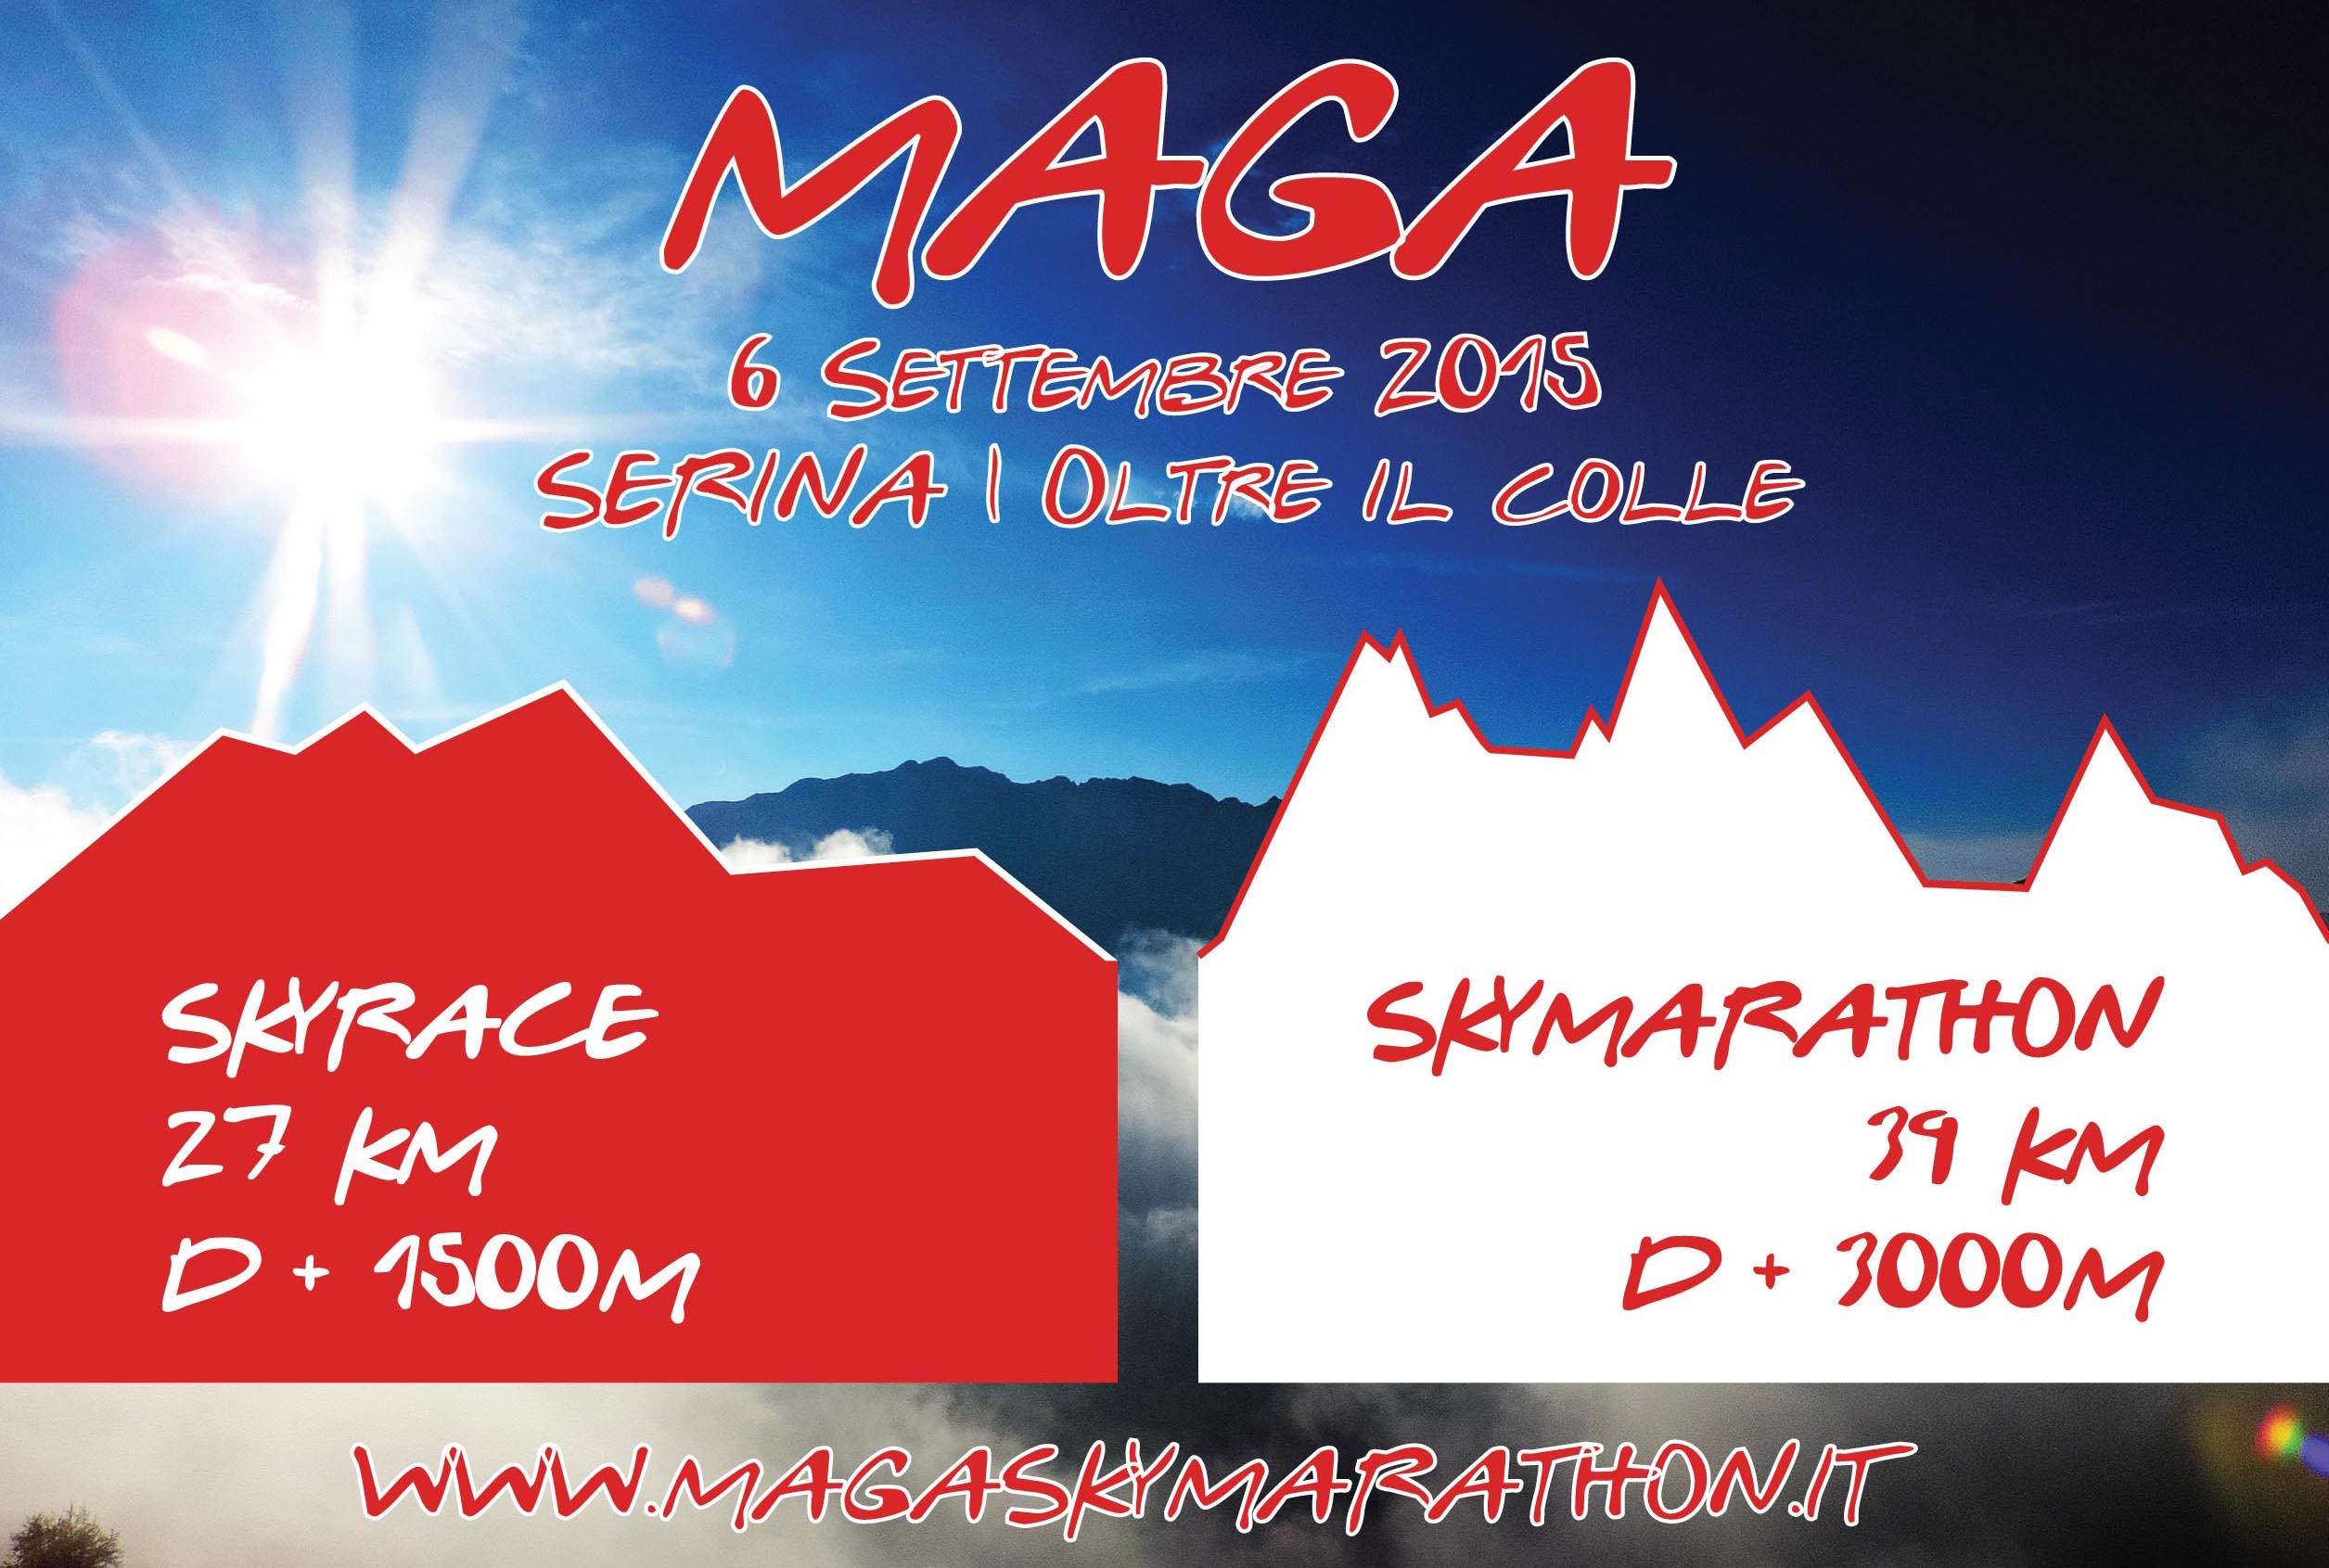 FlyerMaga2015-1